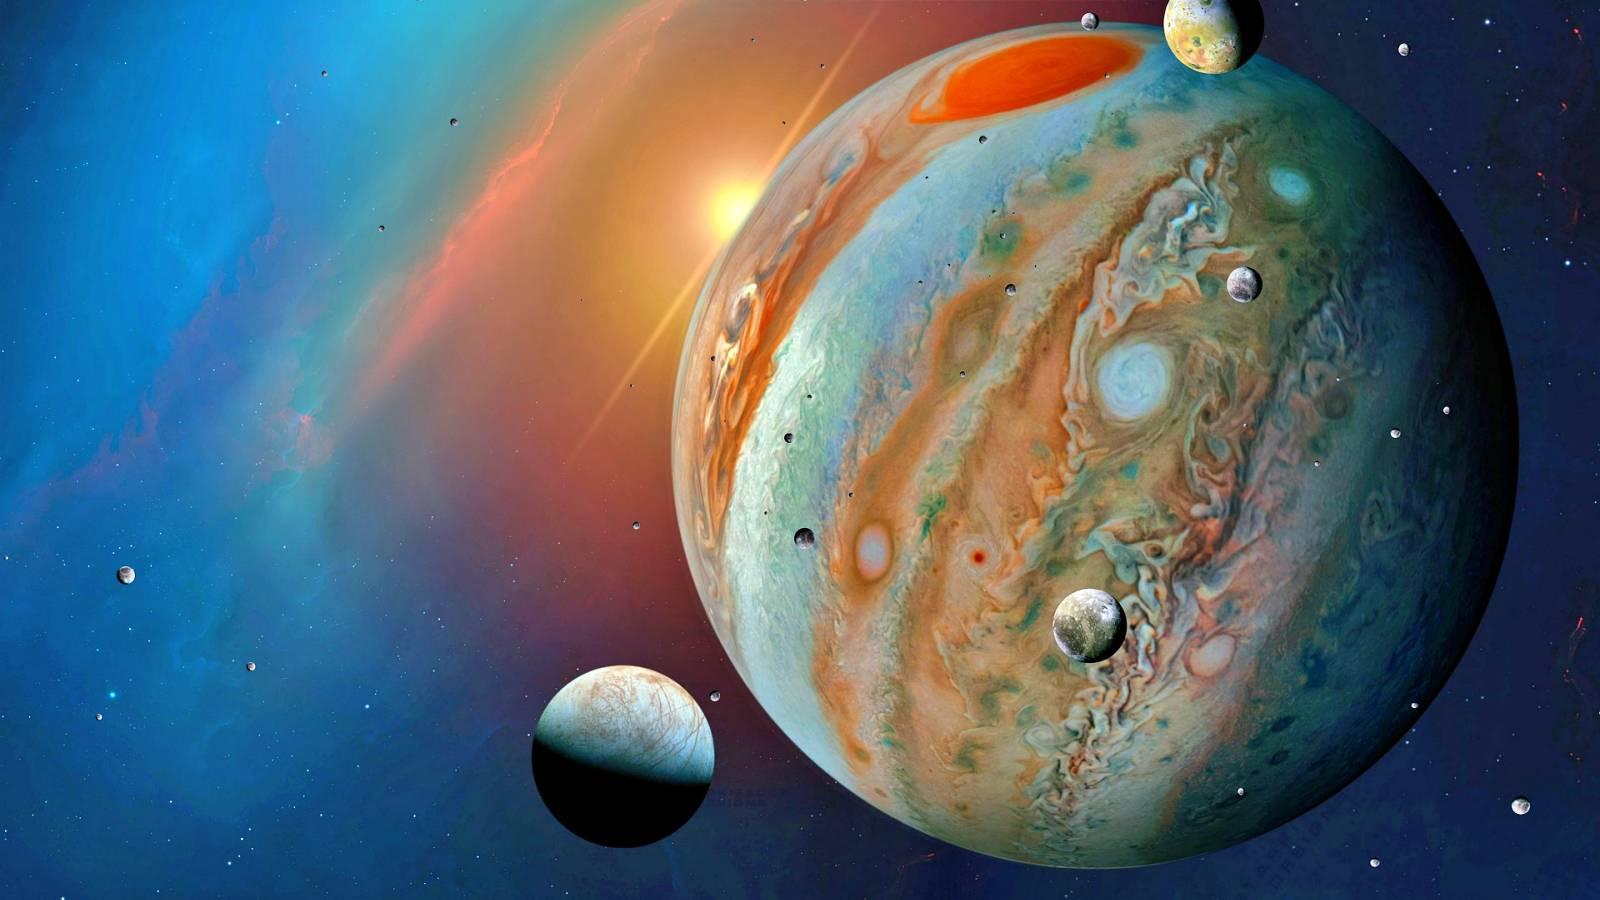 Planeta Jupiter: Anuntul INCREDIBIL, ce se Credea Imposibil - iDevice.ro